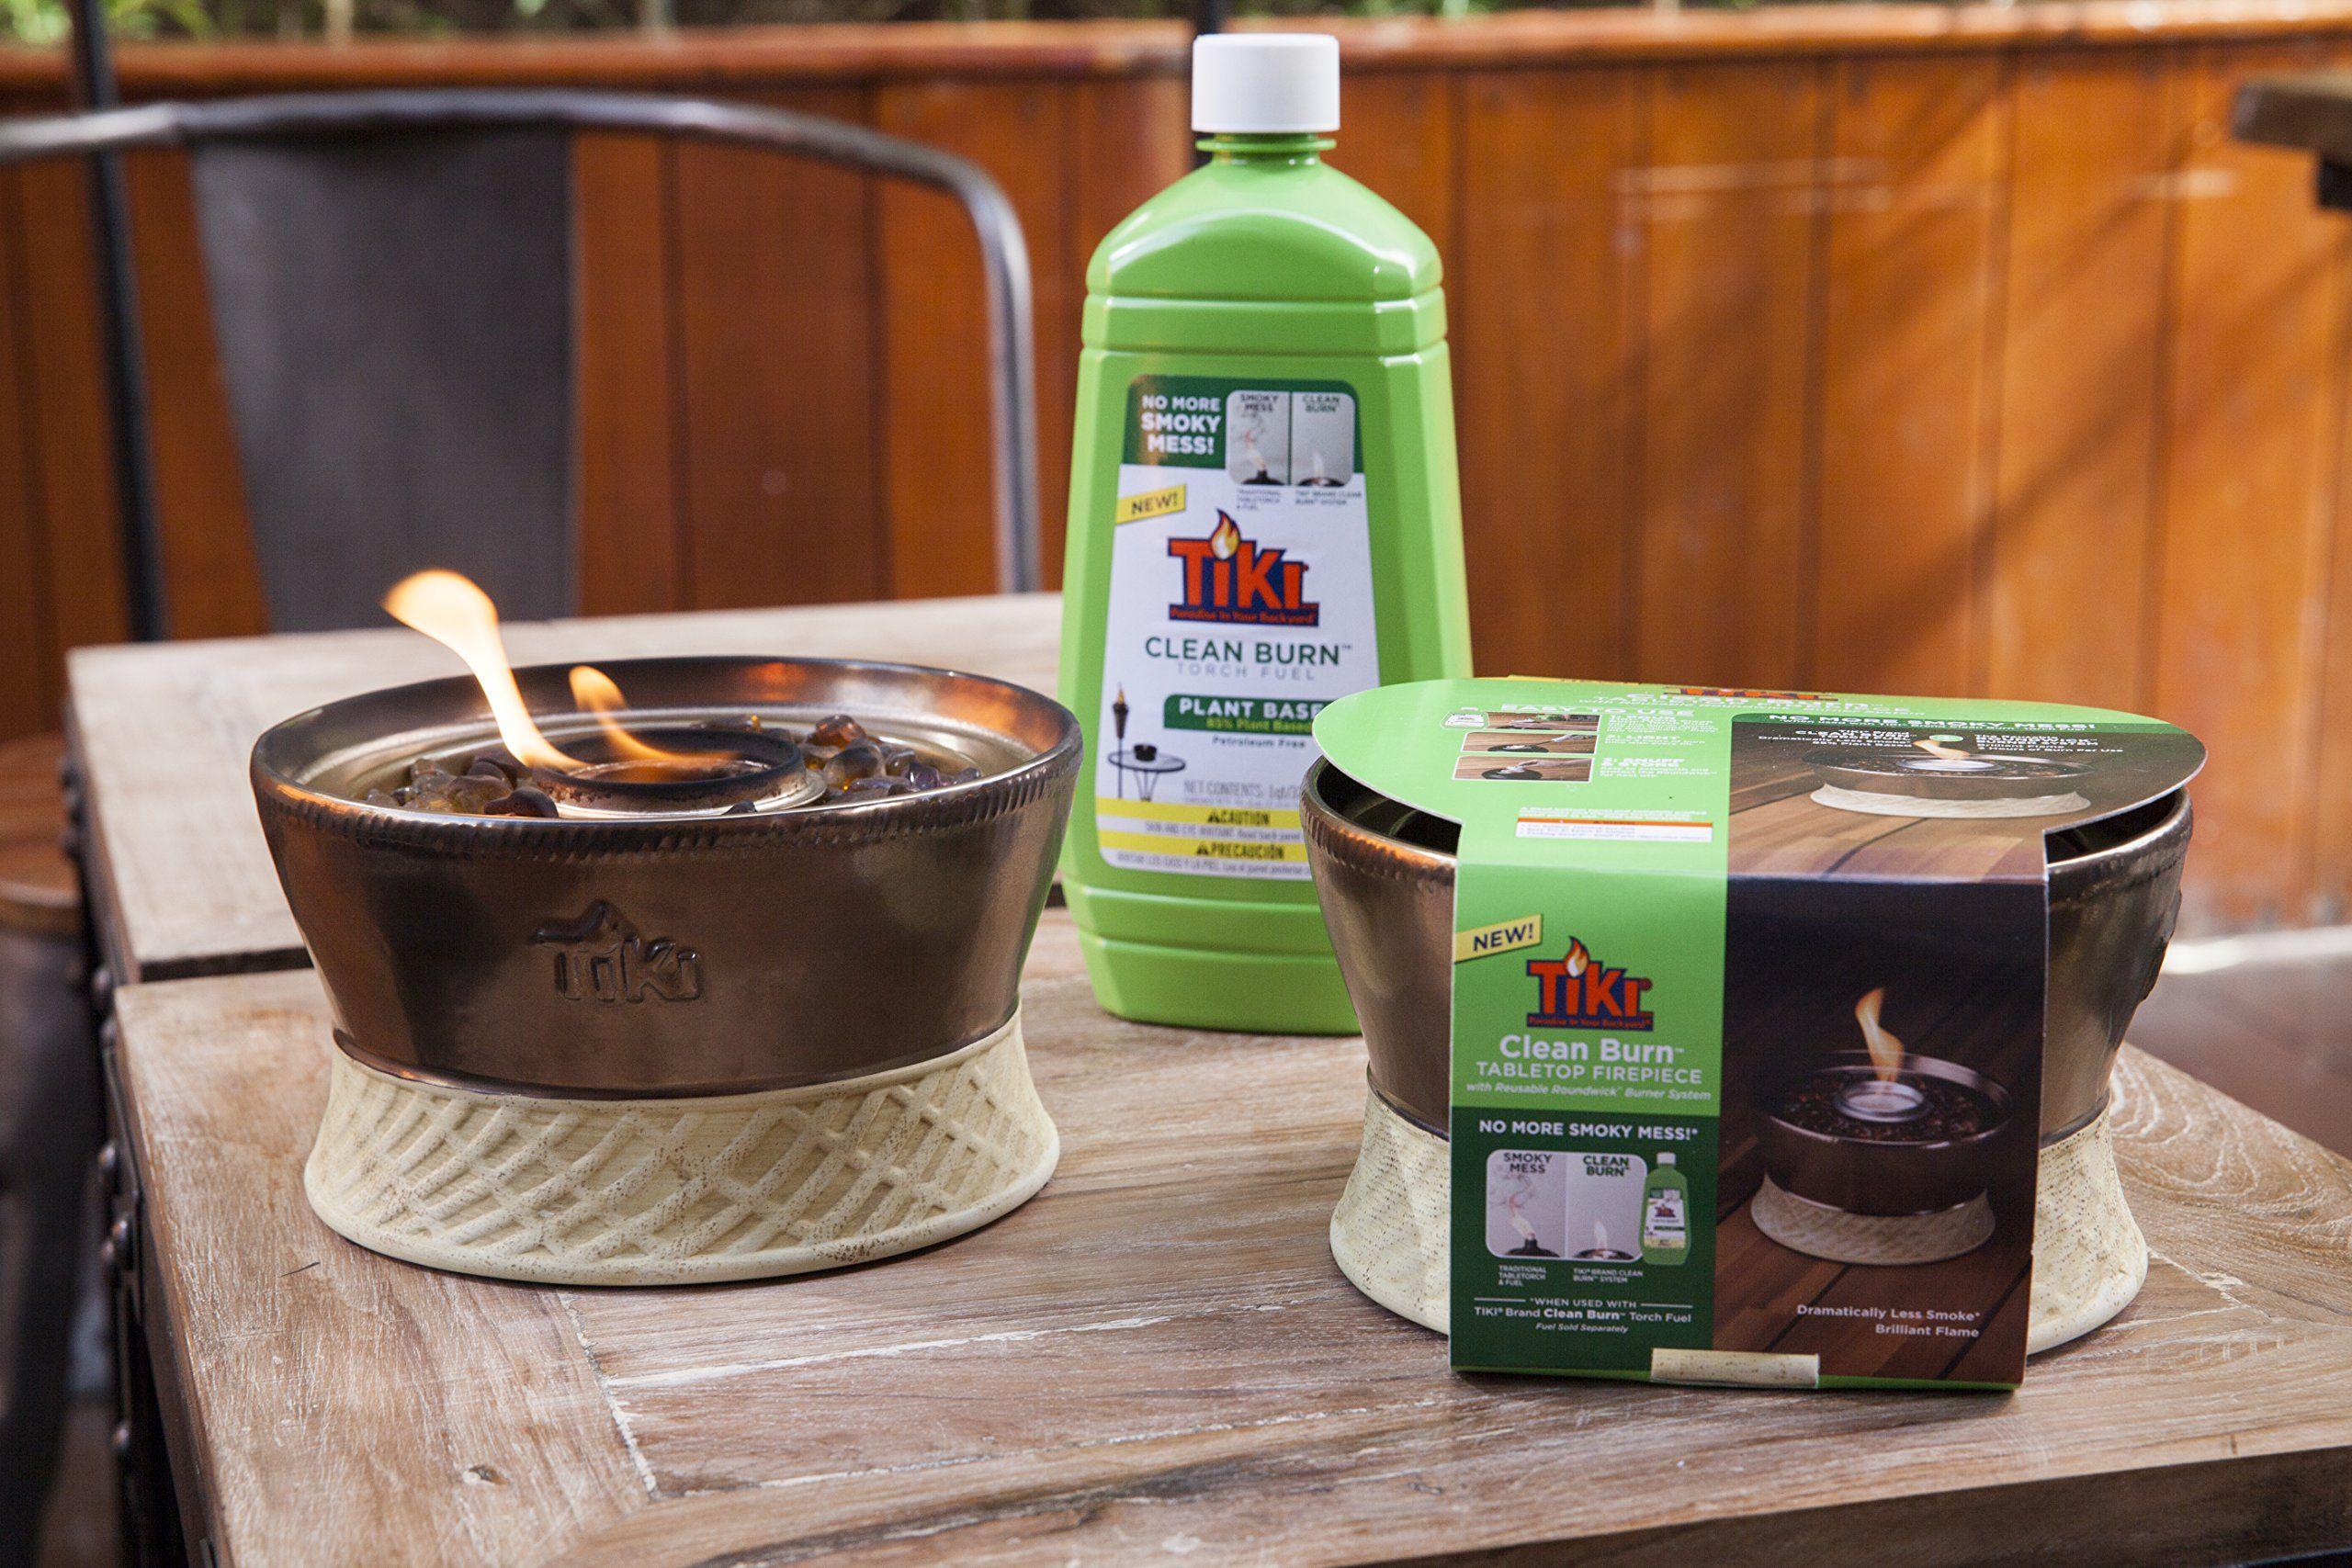 TIKI Brand Clean Burn Ceramic Tabletop Firepiece Torch 7 ...